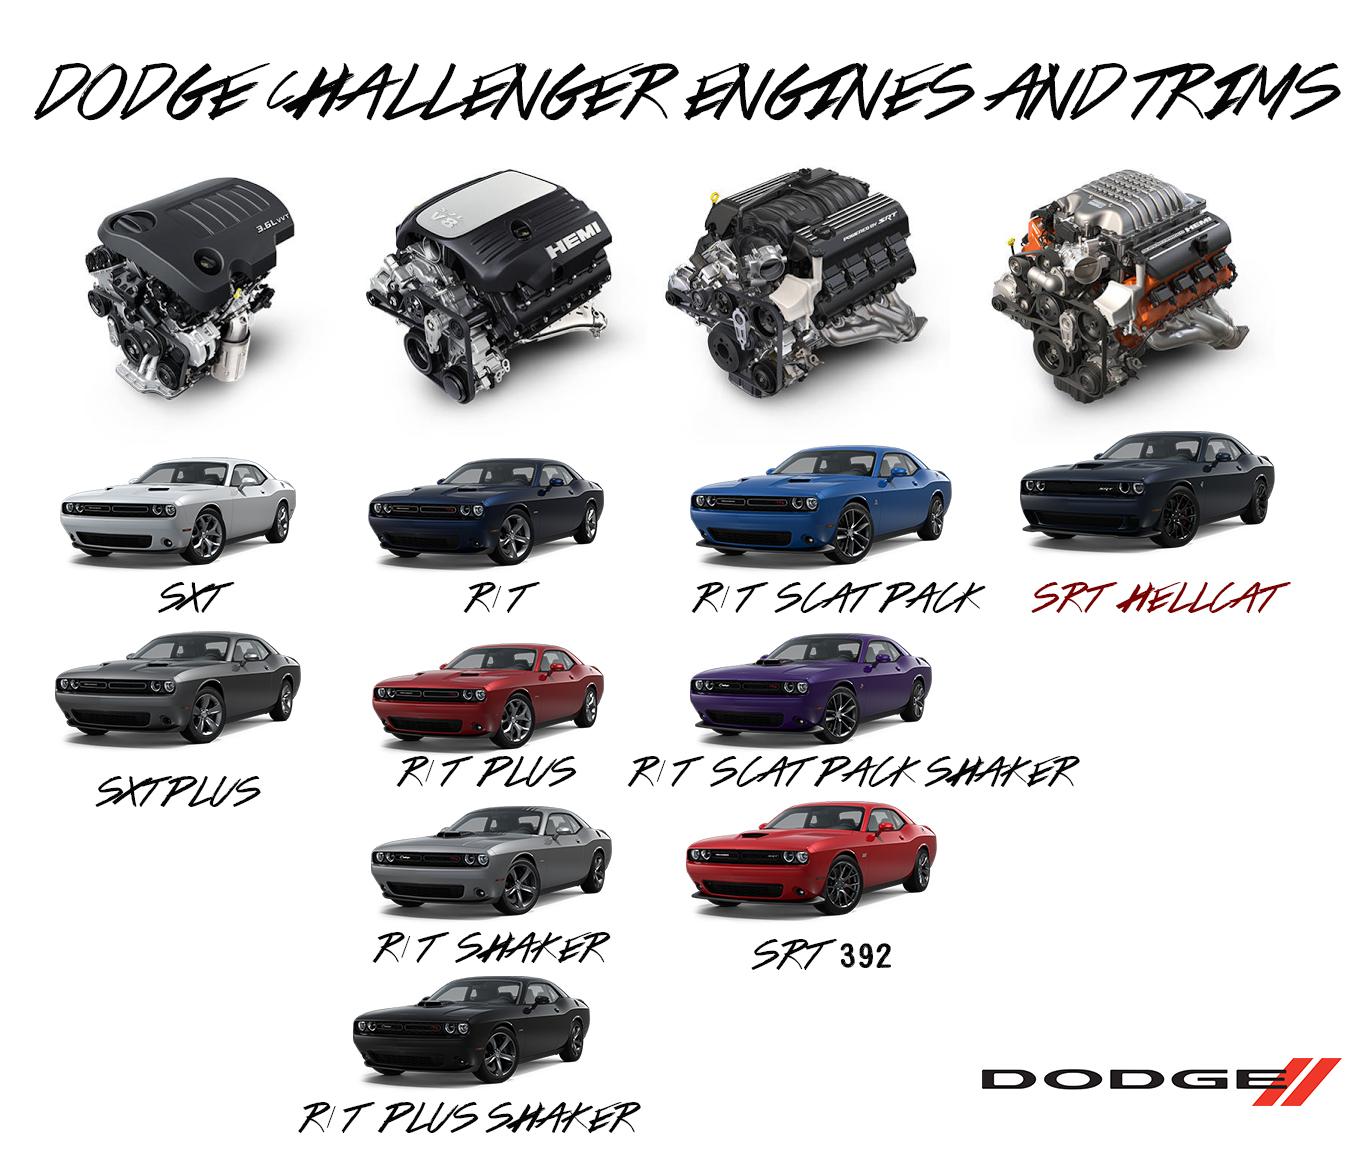 dodge challenger all engines The Dodge Challenger Engines